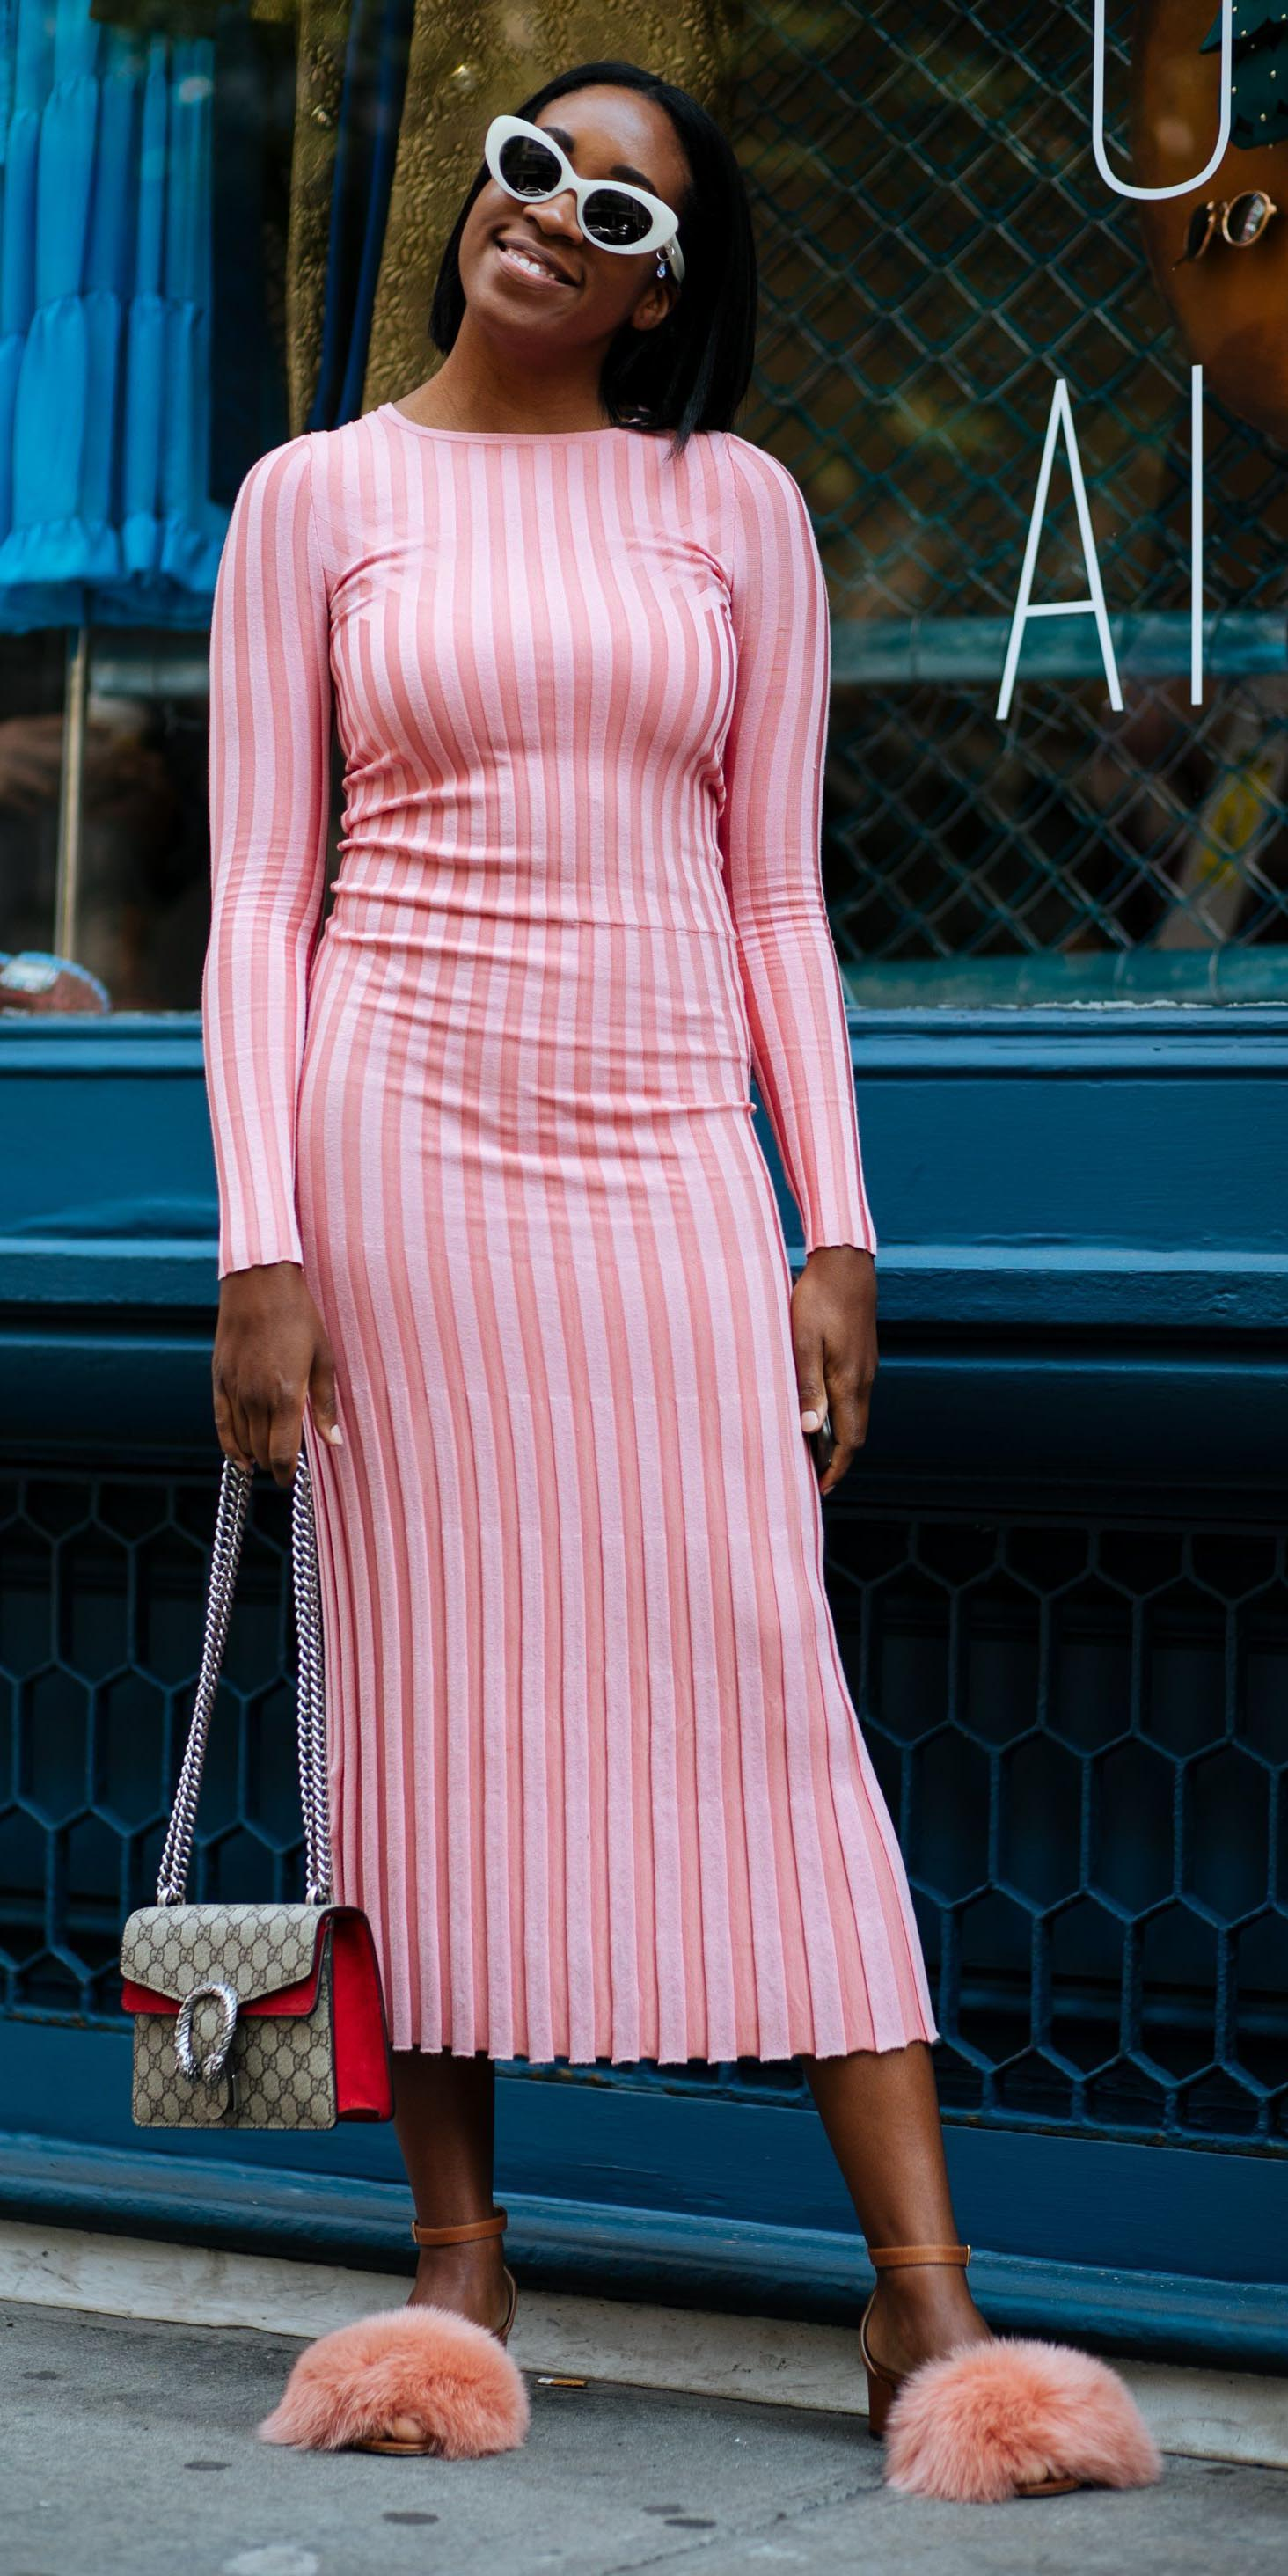 pink-light-dress-midi-bodycon-peach-shoe-sandalh-sun-brun-bob-spring-summer-lunch.jpg